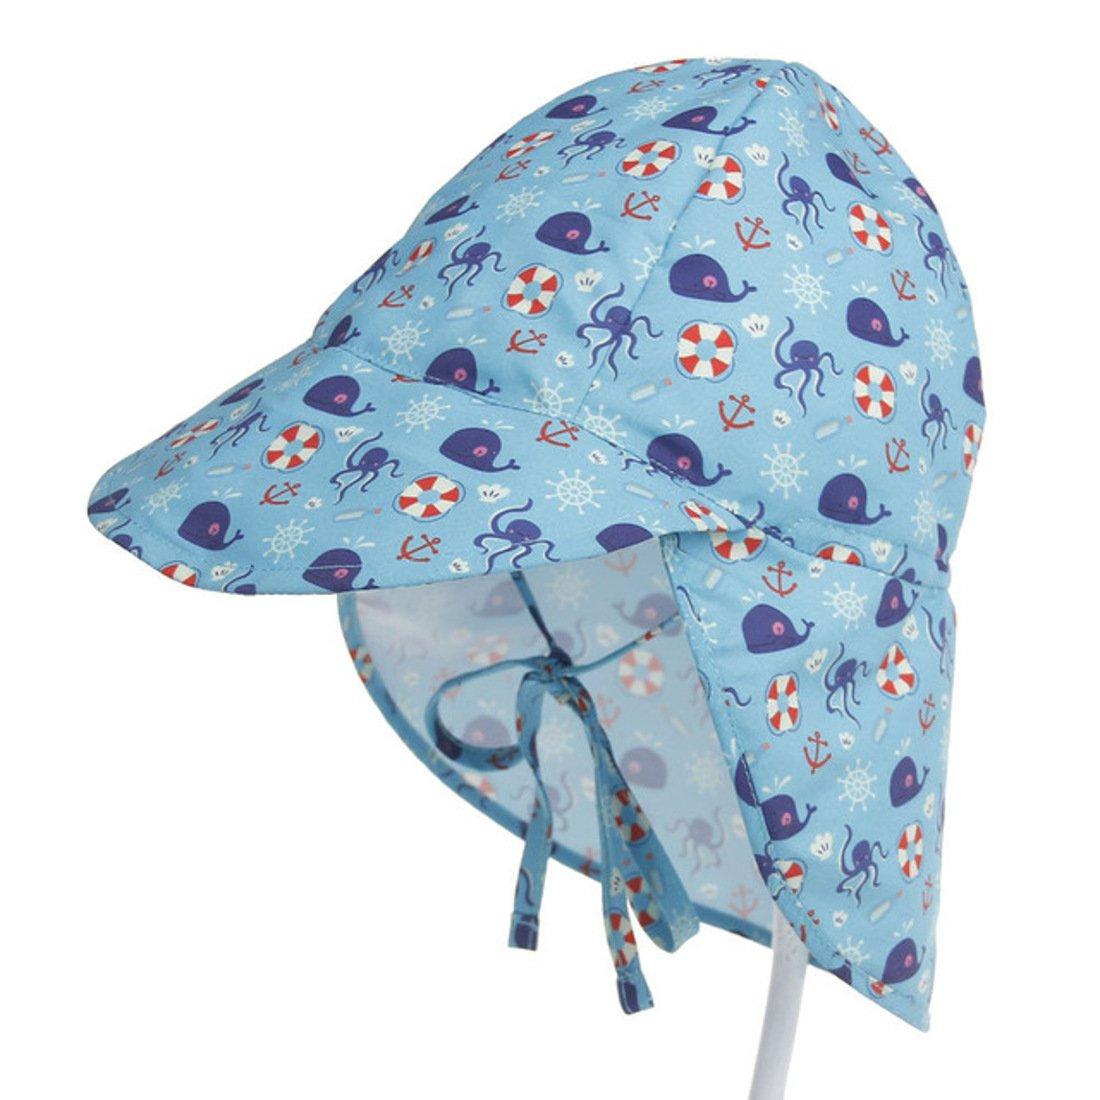 Watermelon Baby Girls Boys Cotton Neck Sun Protection Flap Legionnaires Summer Cap Hat 0-6 Months